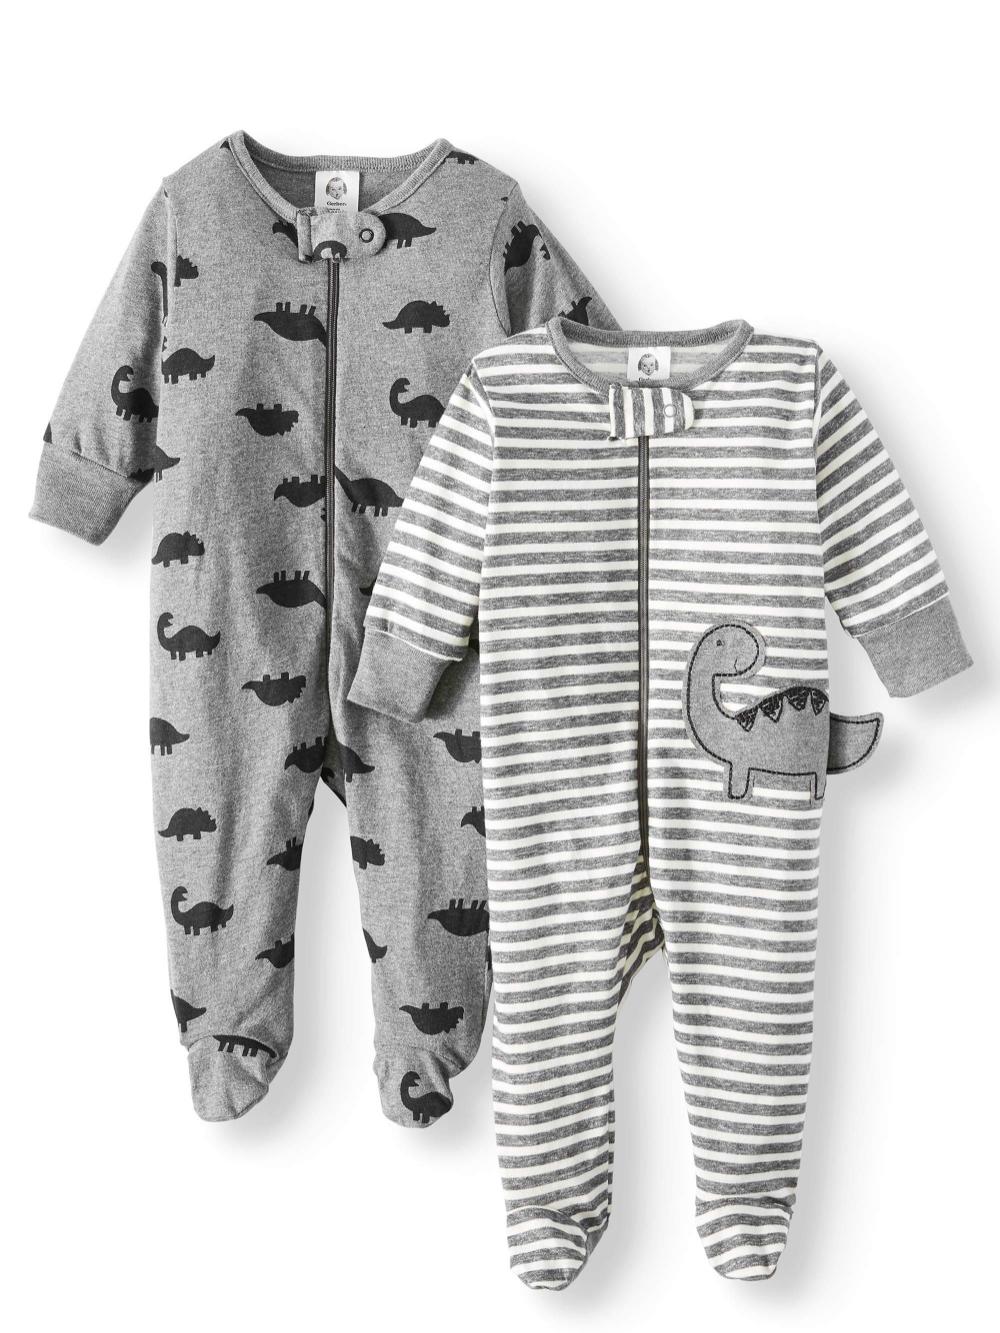 Gerber Boys 2-Pack Firetrucks Sleeps /'n Plays Set Size 3-6M BABY CLOTHES GIFT